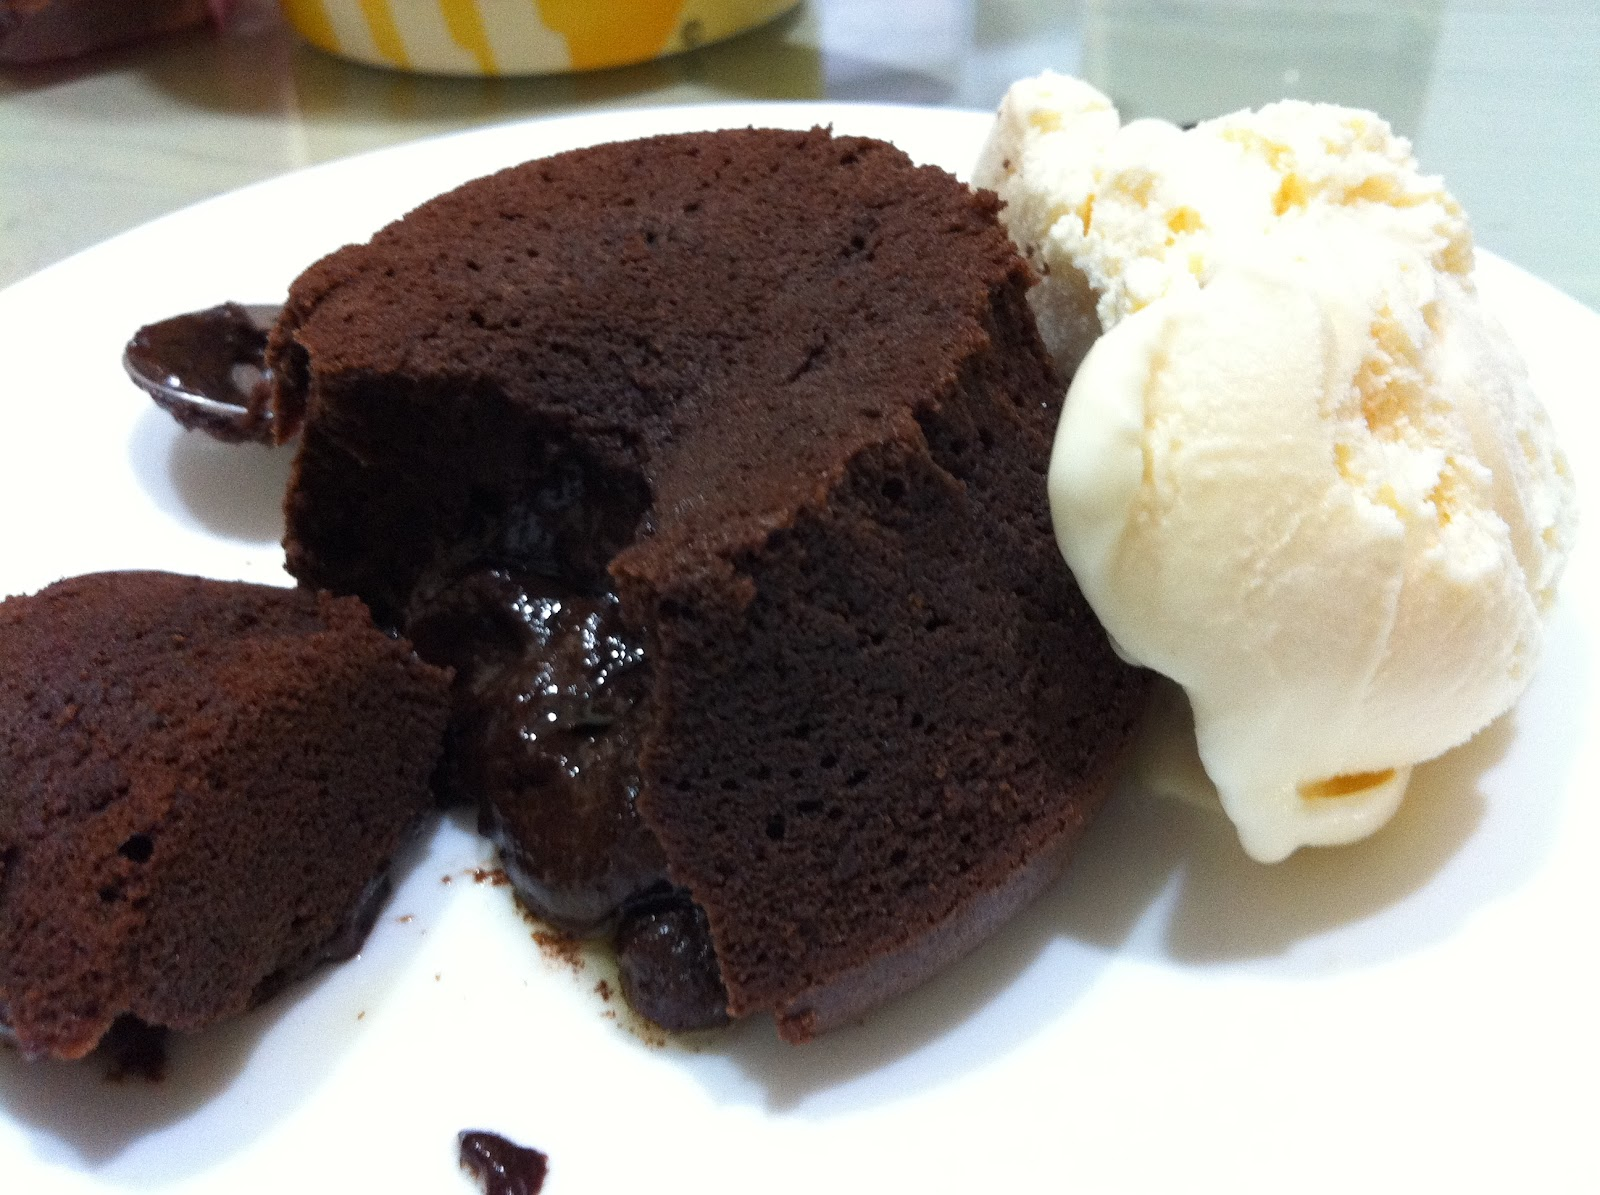 Dessert Chocolate Lava Cake Chocolate Lava Cakes Off